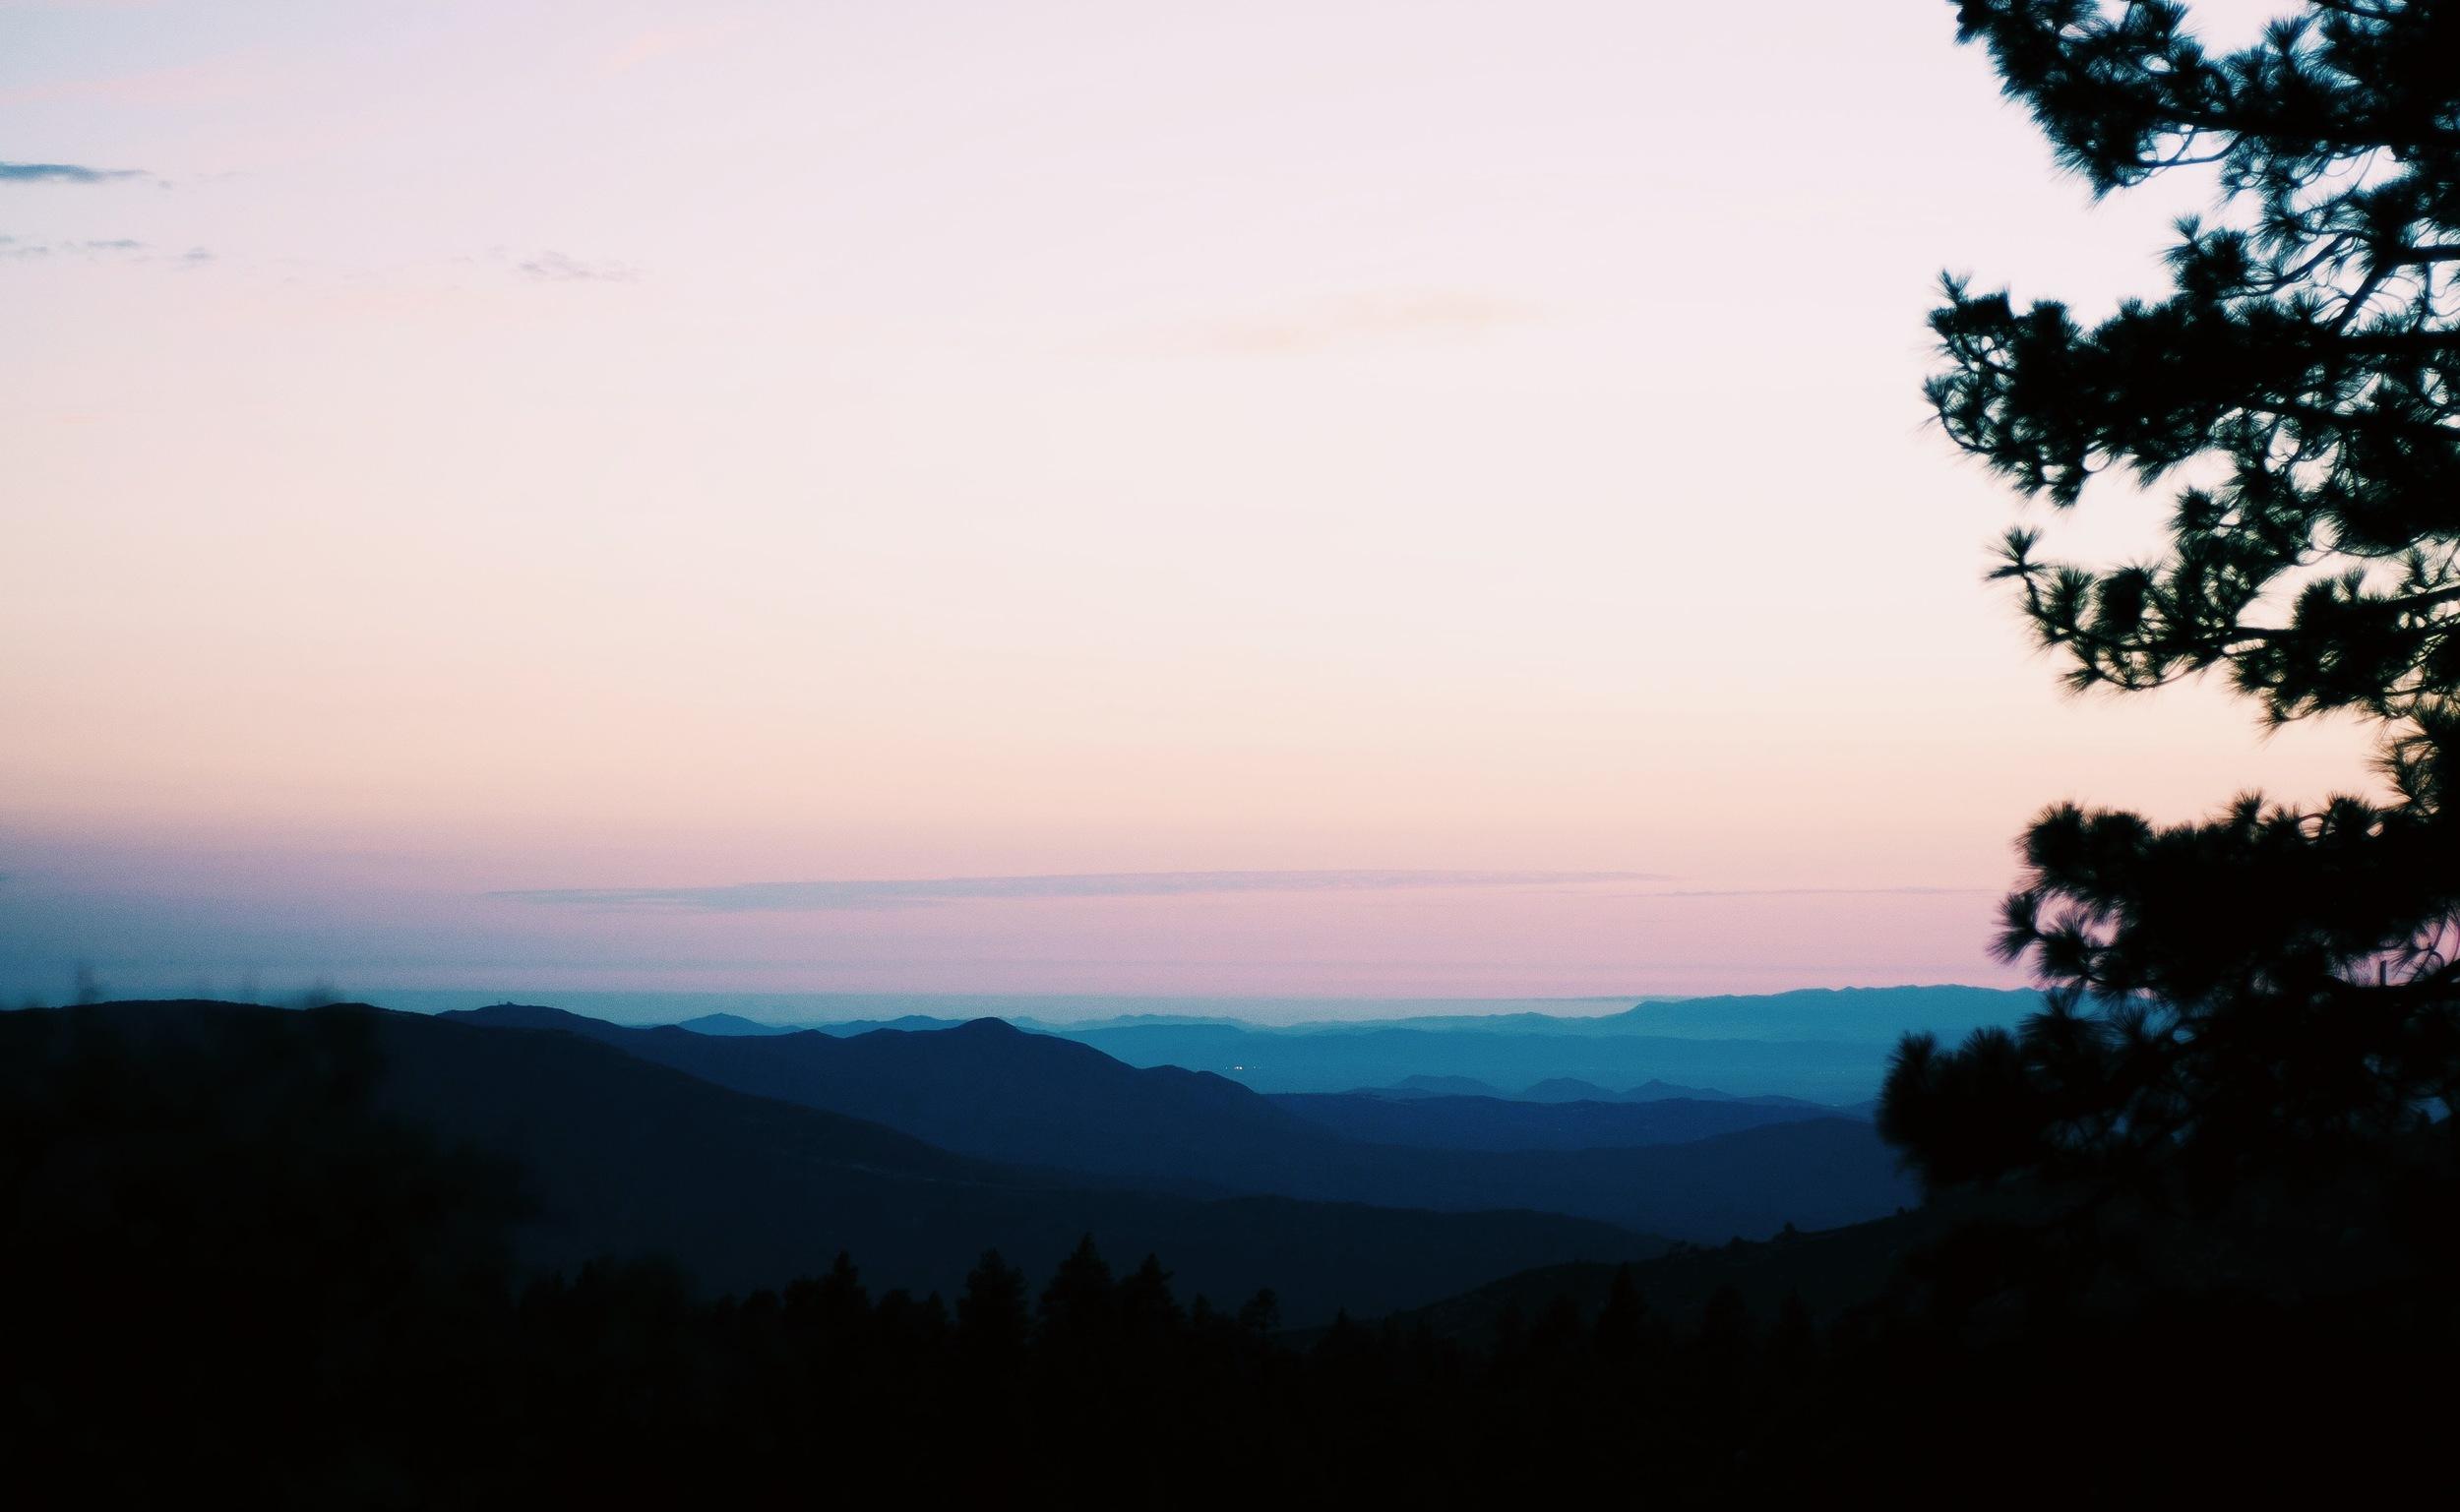 Sunset in Idyllwild.